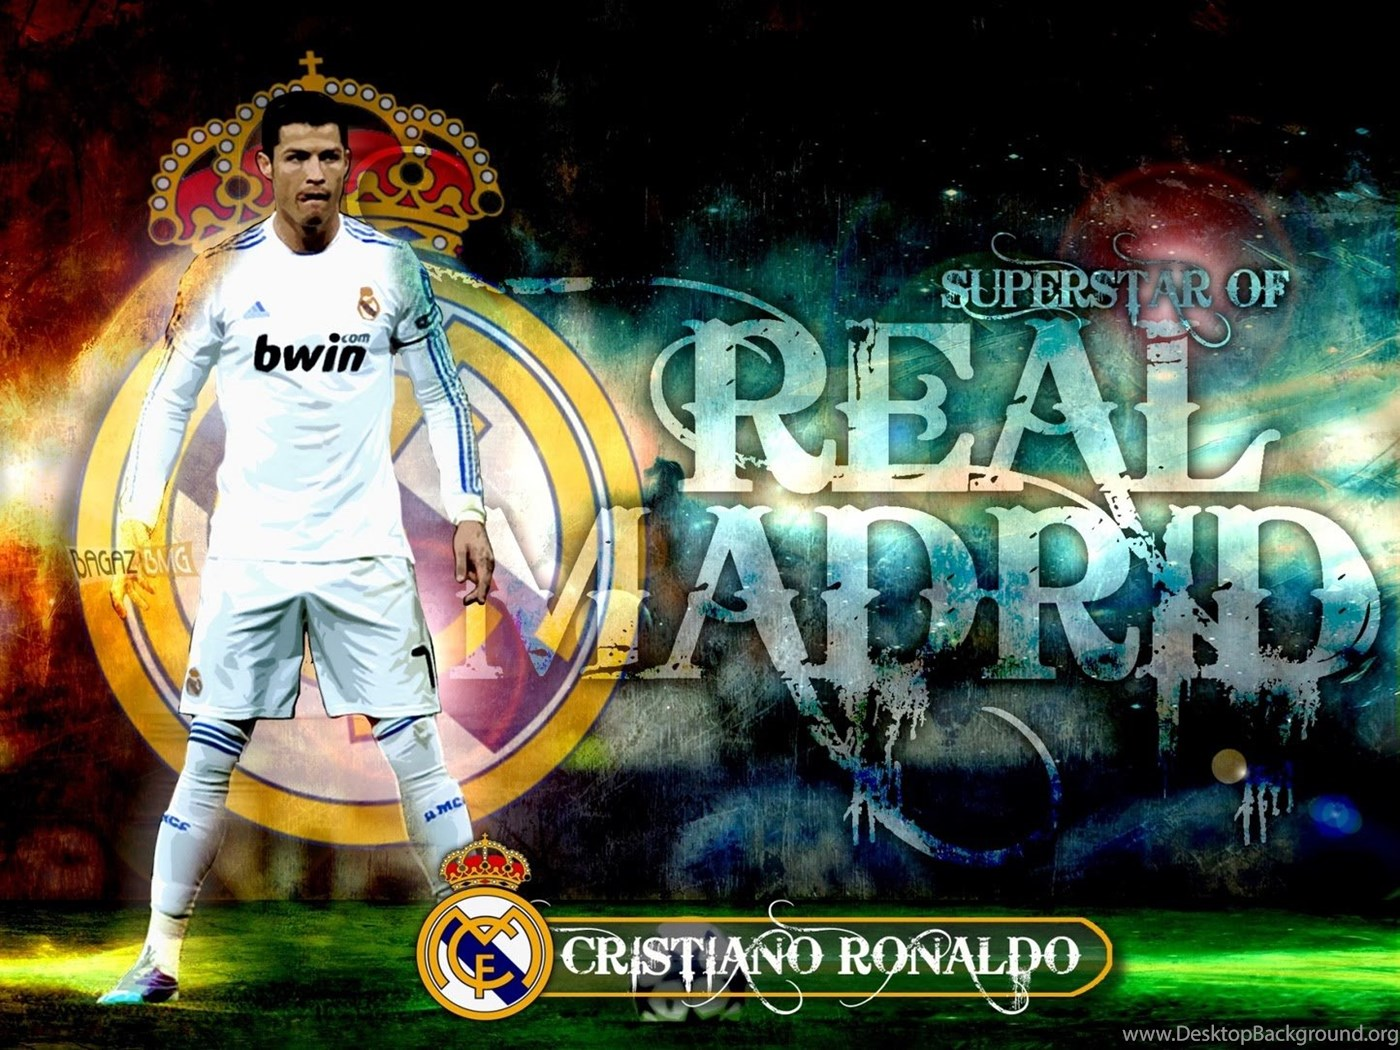 Cristiano Ronaldo Real Madrid Best Wallpapers Desktop Background